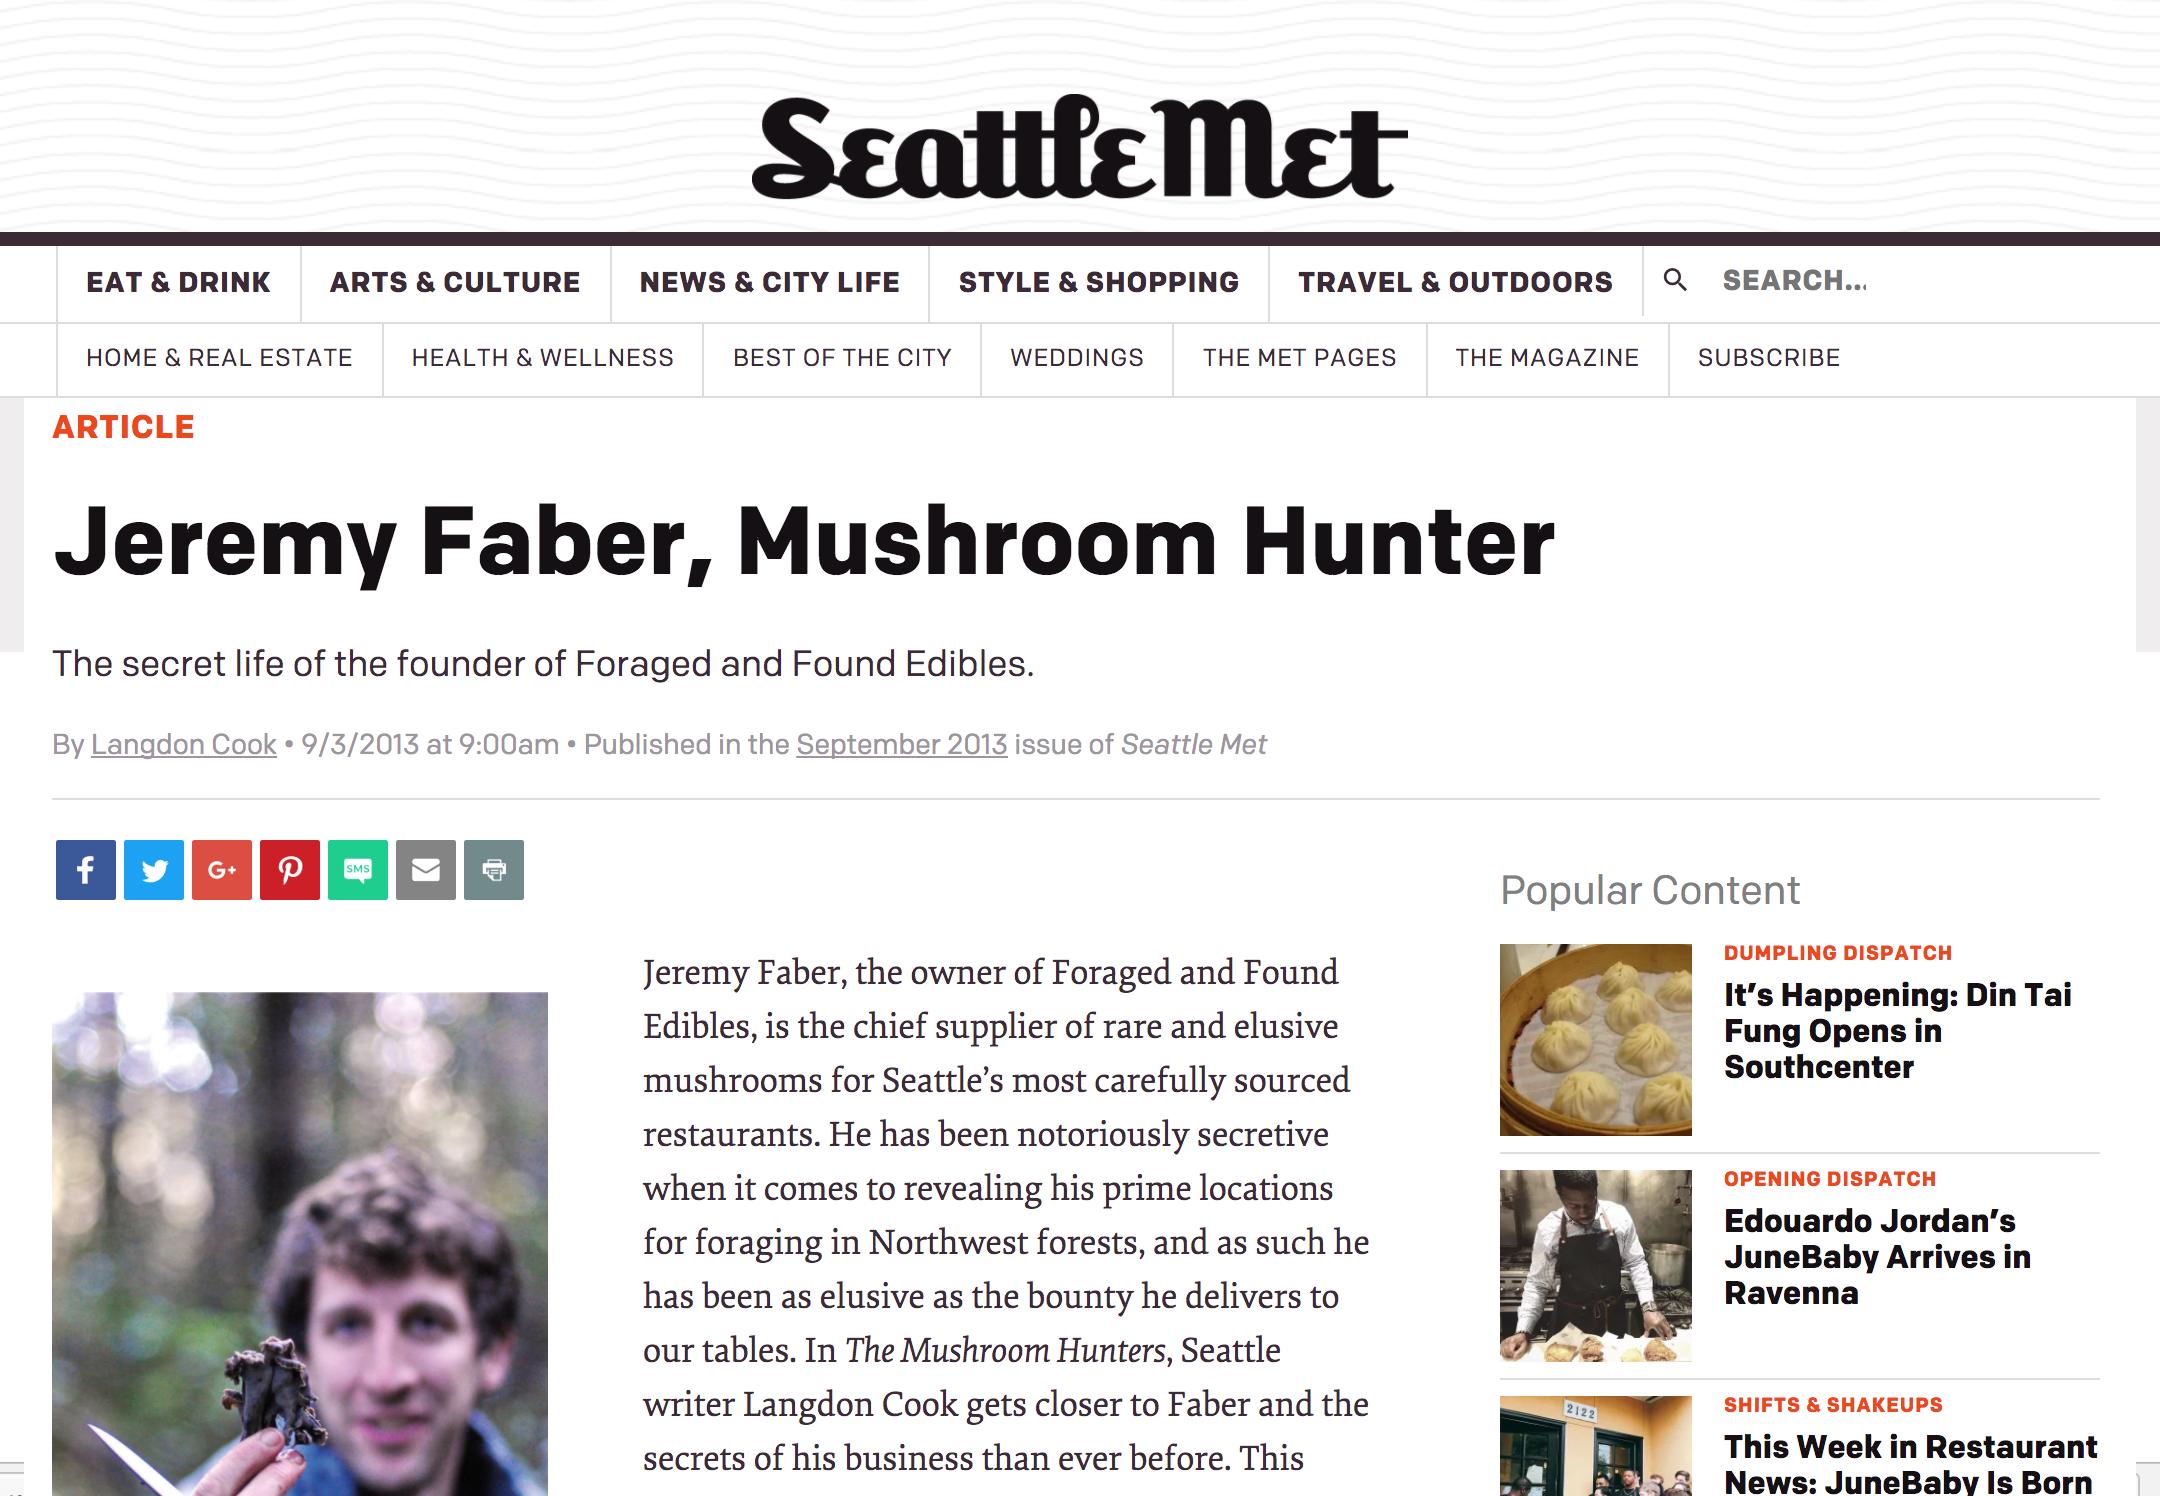 Seattle Met:  Jeremy Faber, Mushroom Hunter